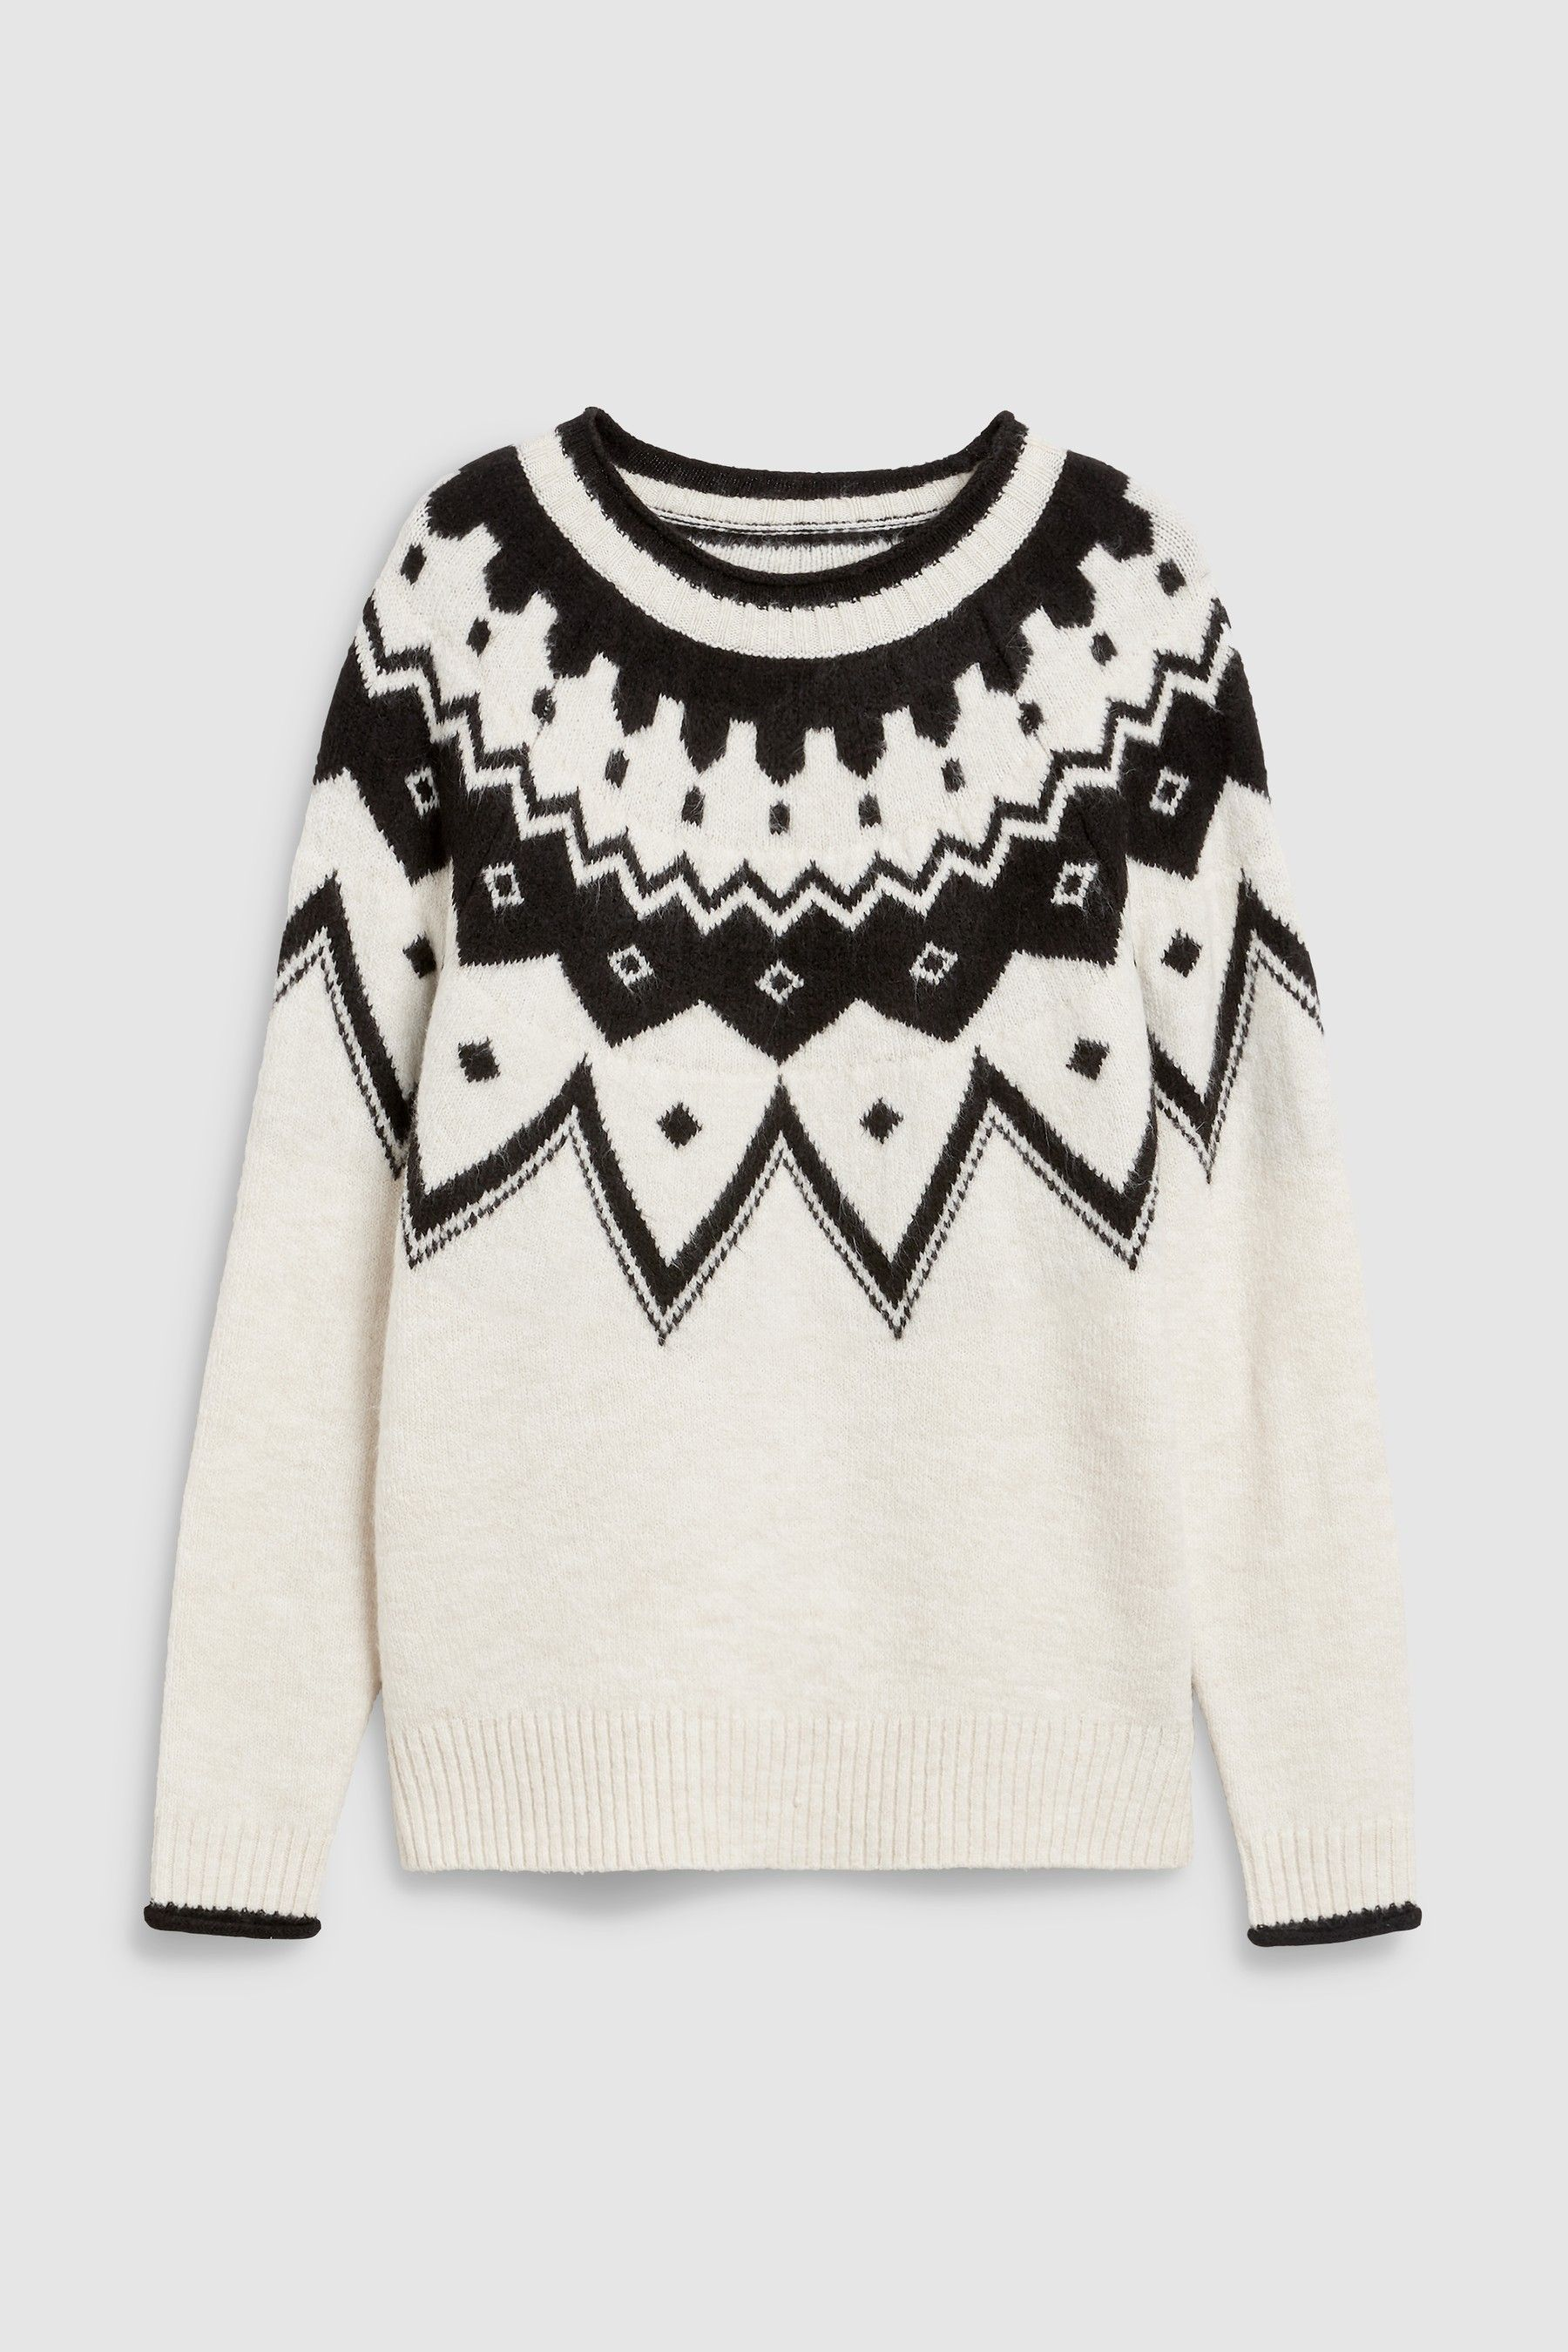 61102880f09 Womens Next Monochrome Fairisle Pattern Sweater - Cream